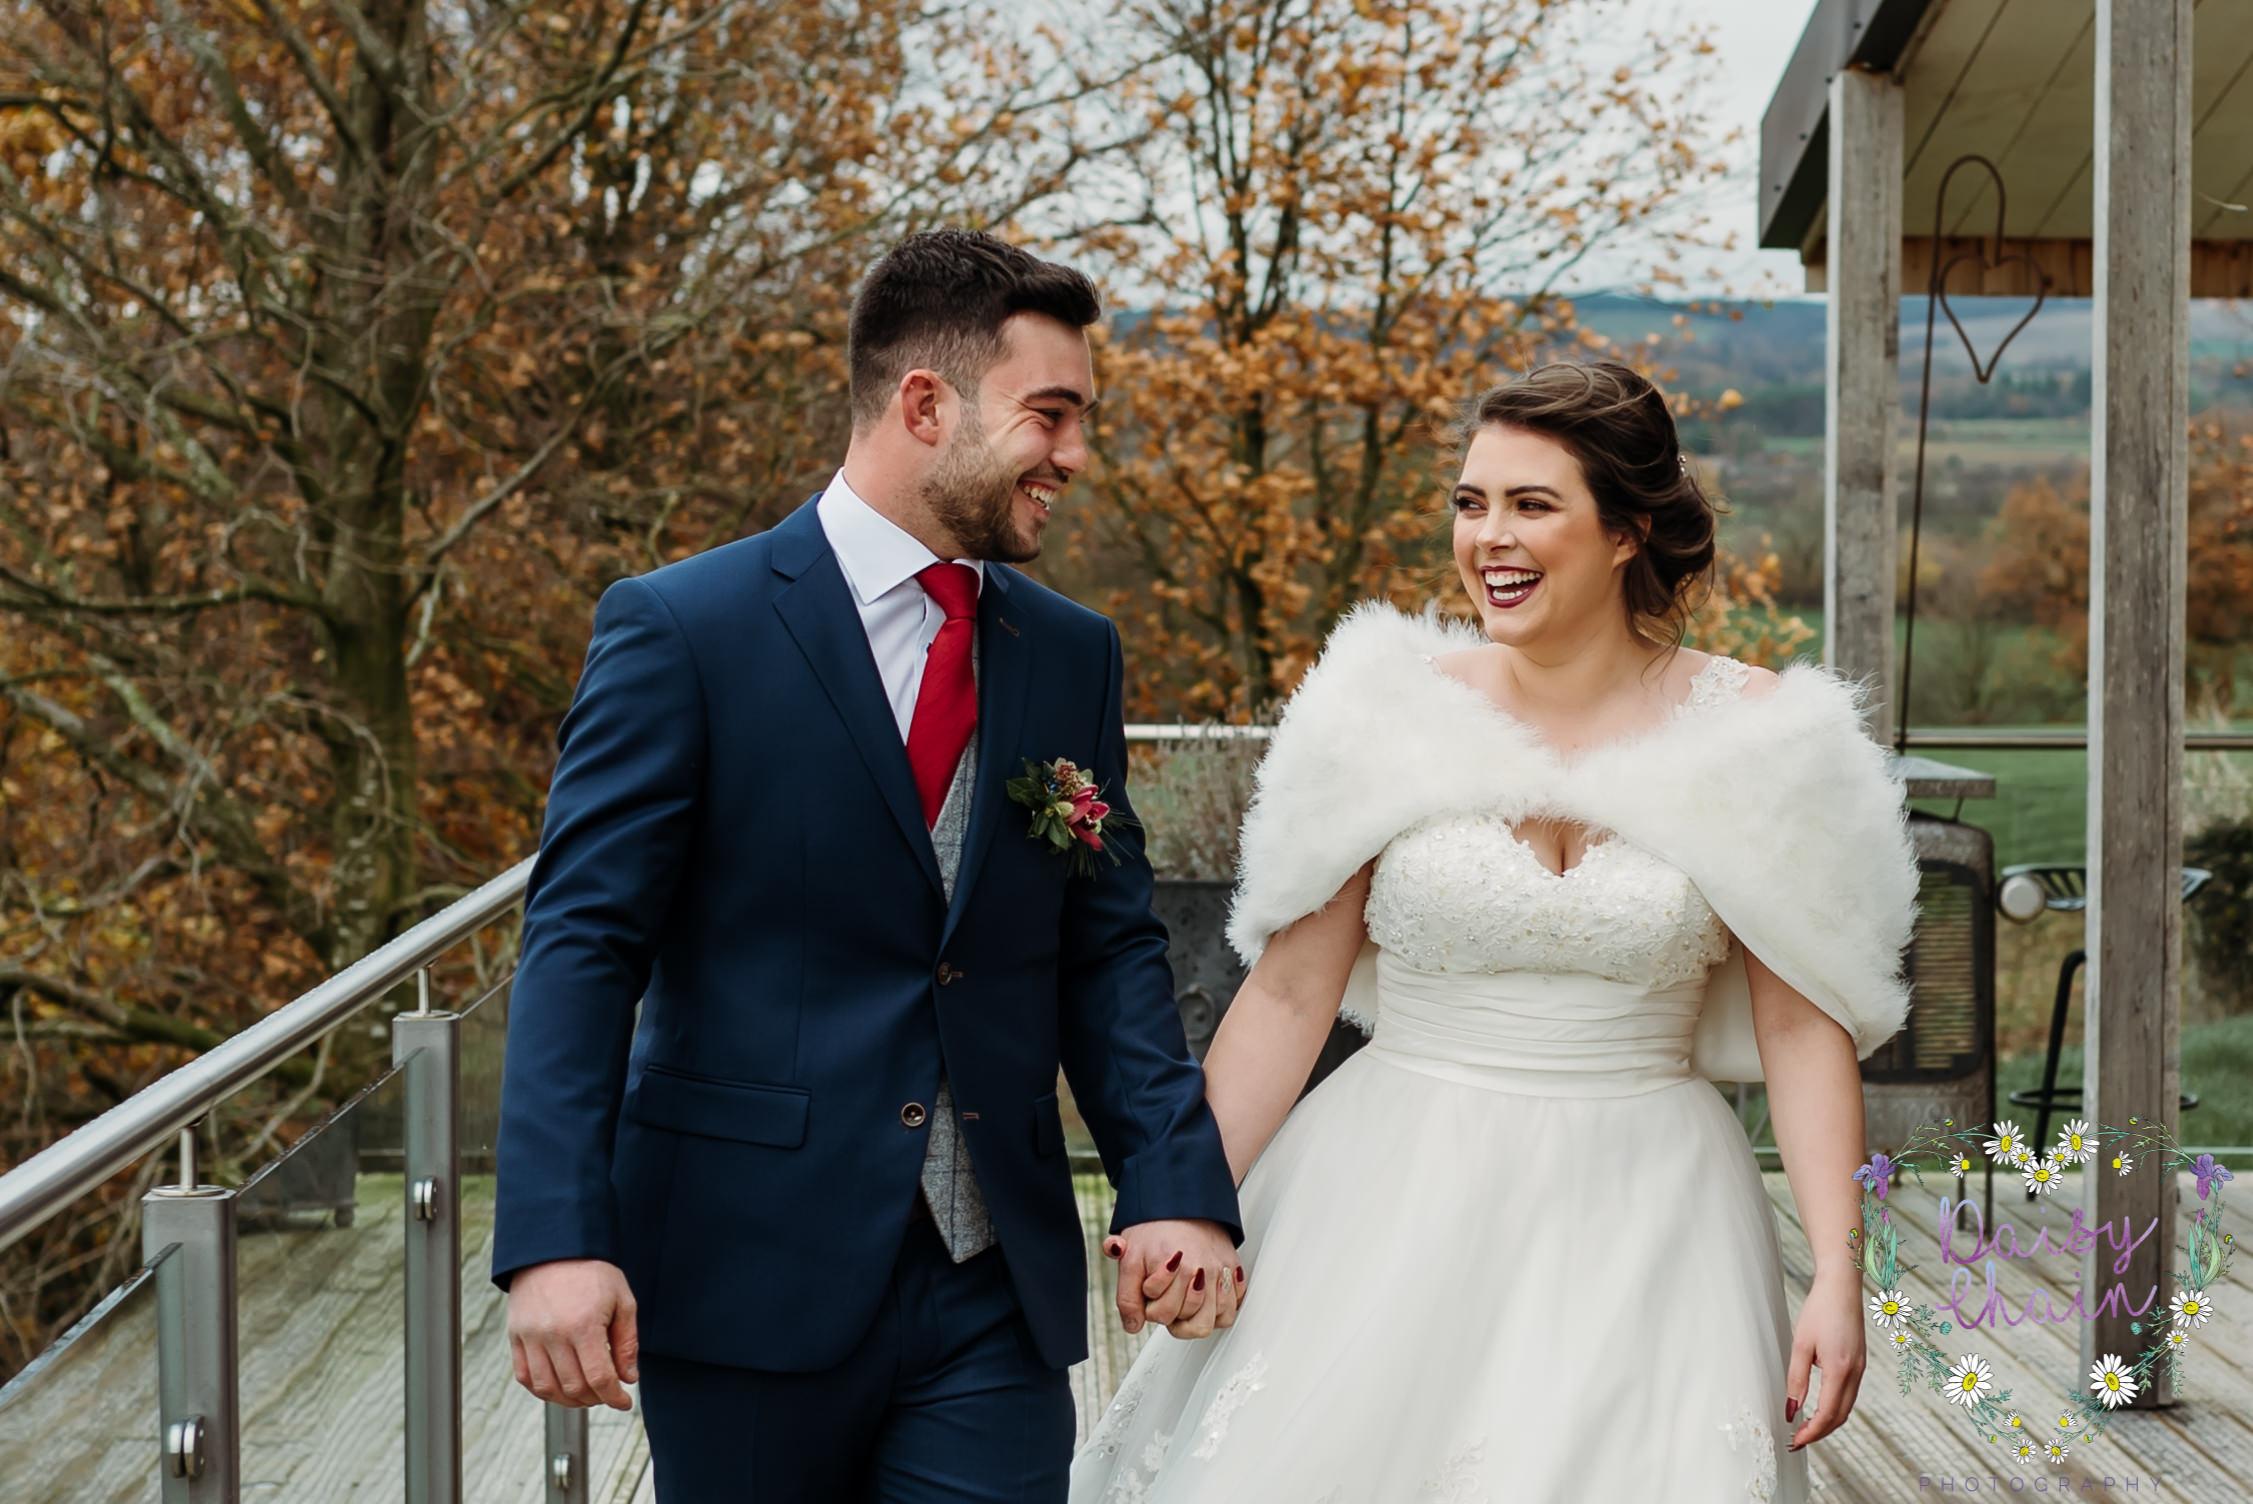 Bashall Barn, Clitheroe wedding